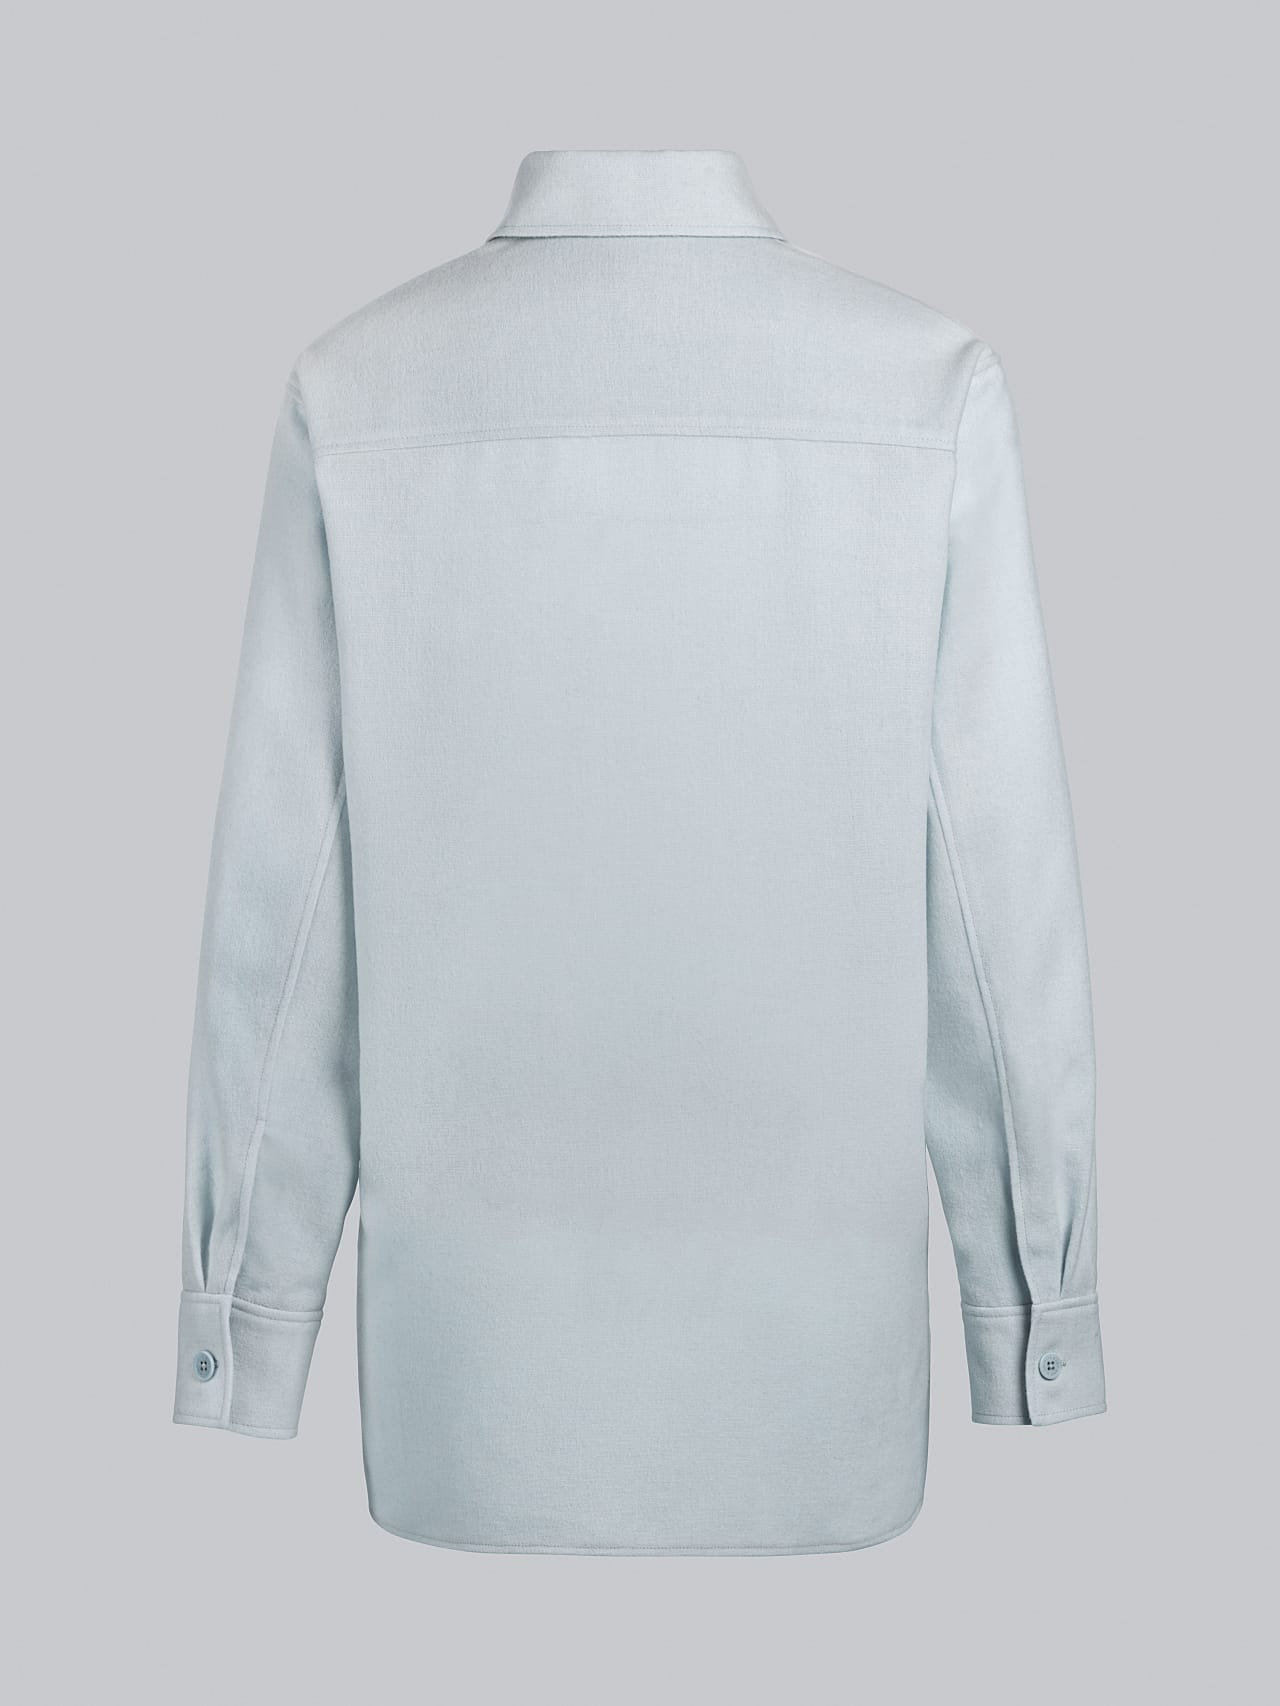 WOVIE V1.Y5.02 Wool Over-Shirt Pale Blue  Left Alpha Tauri